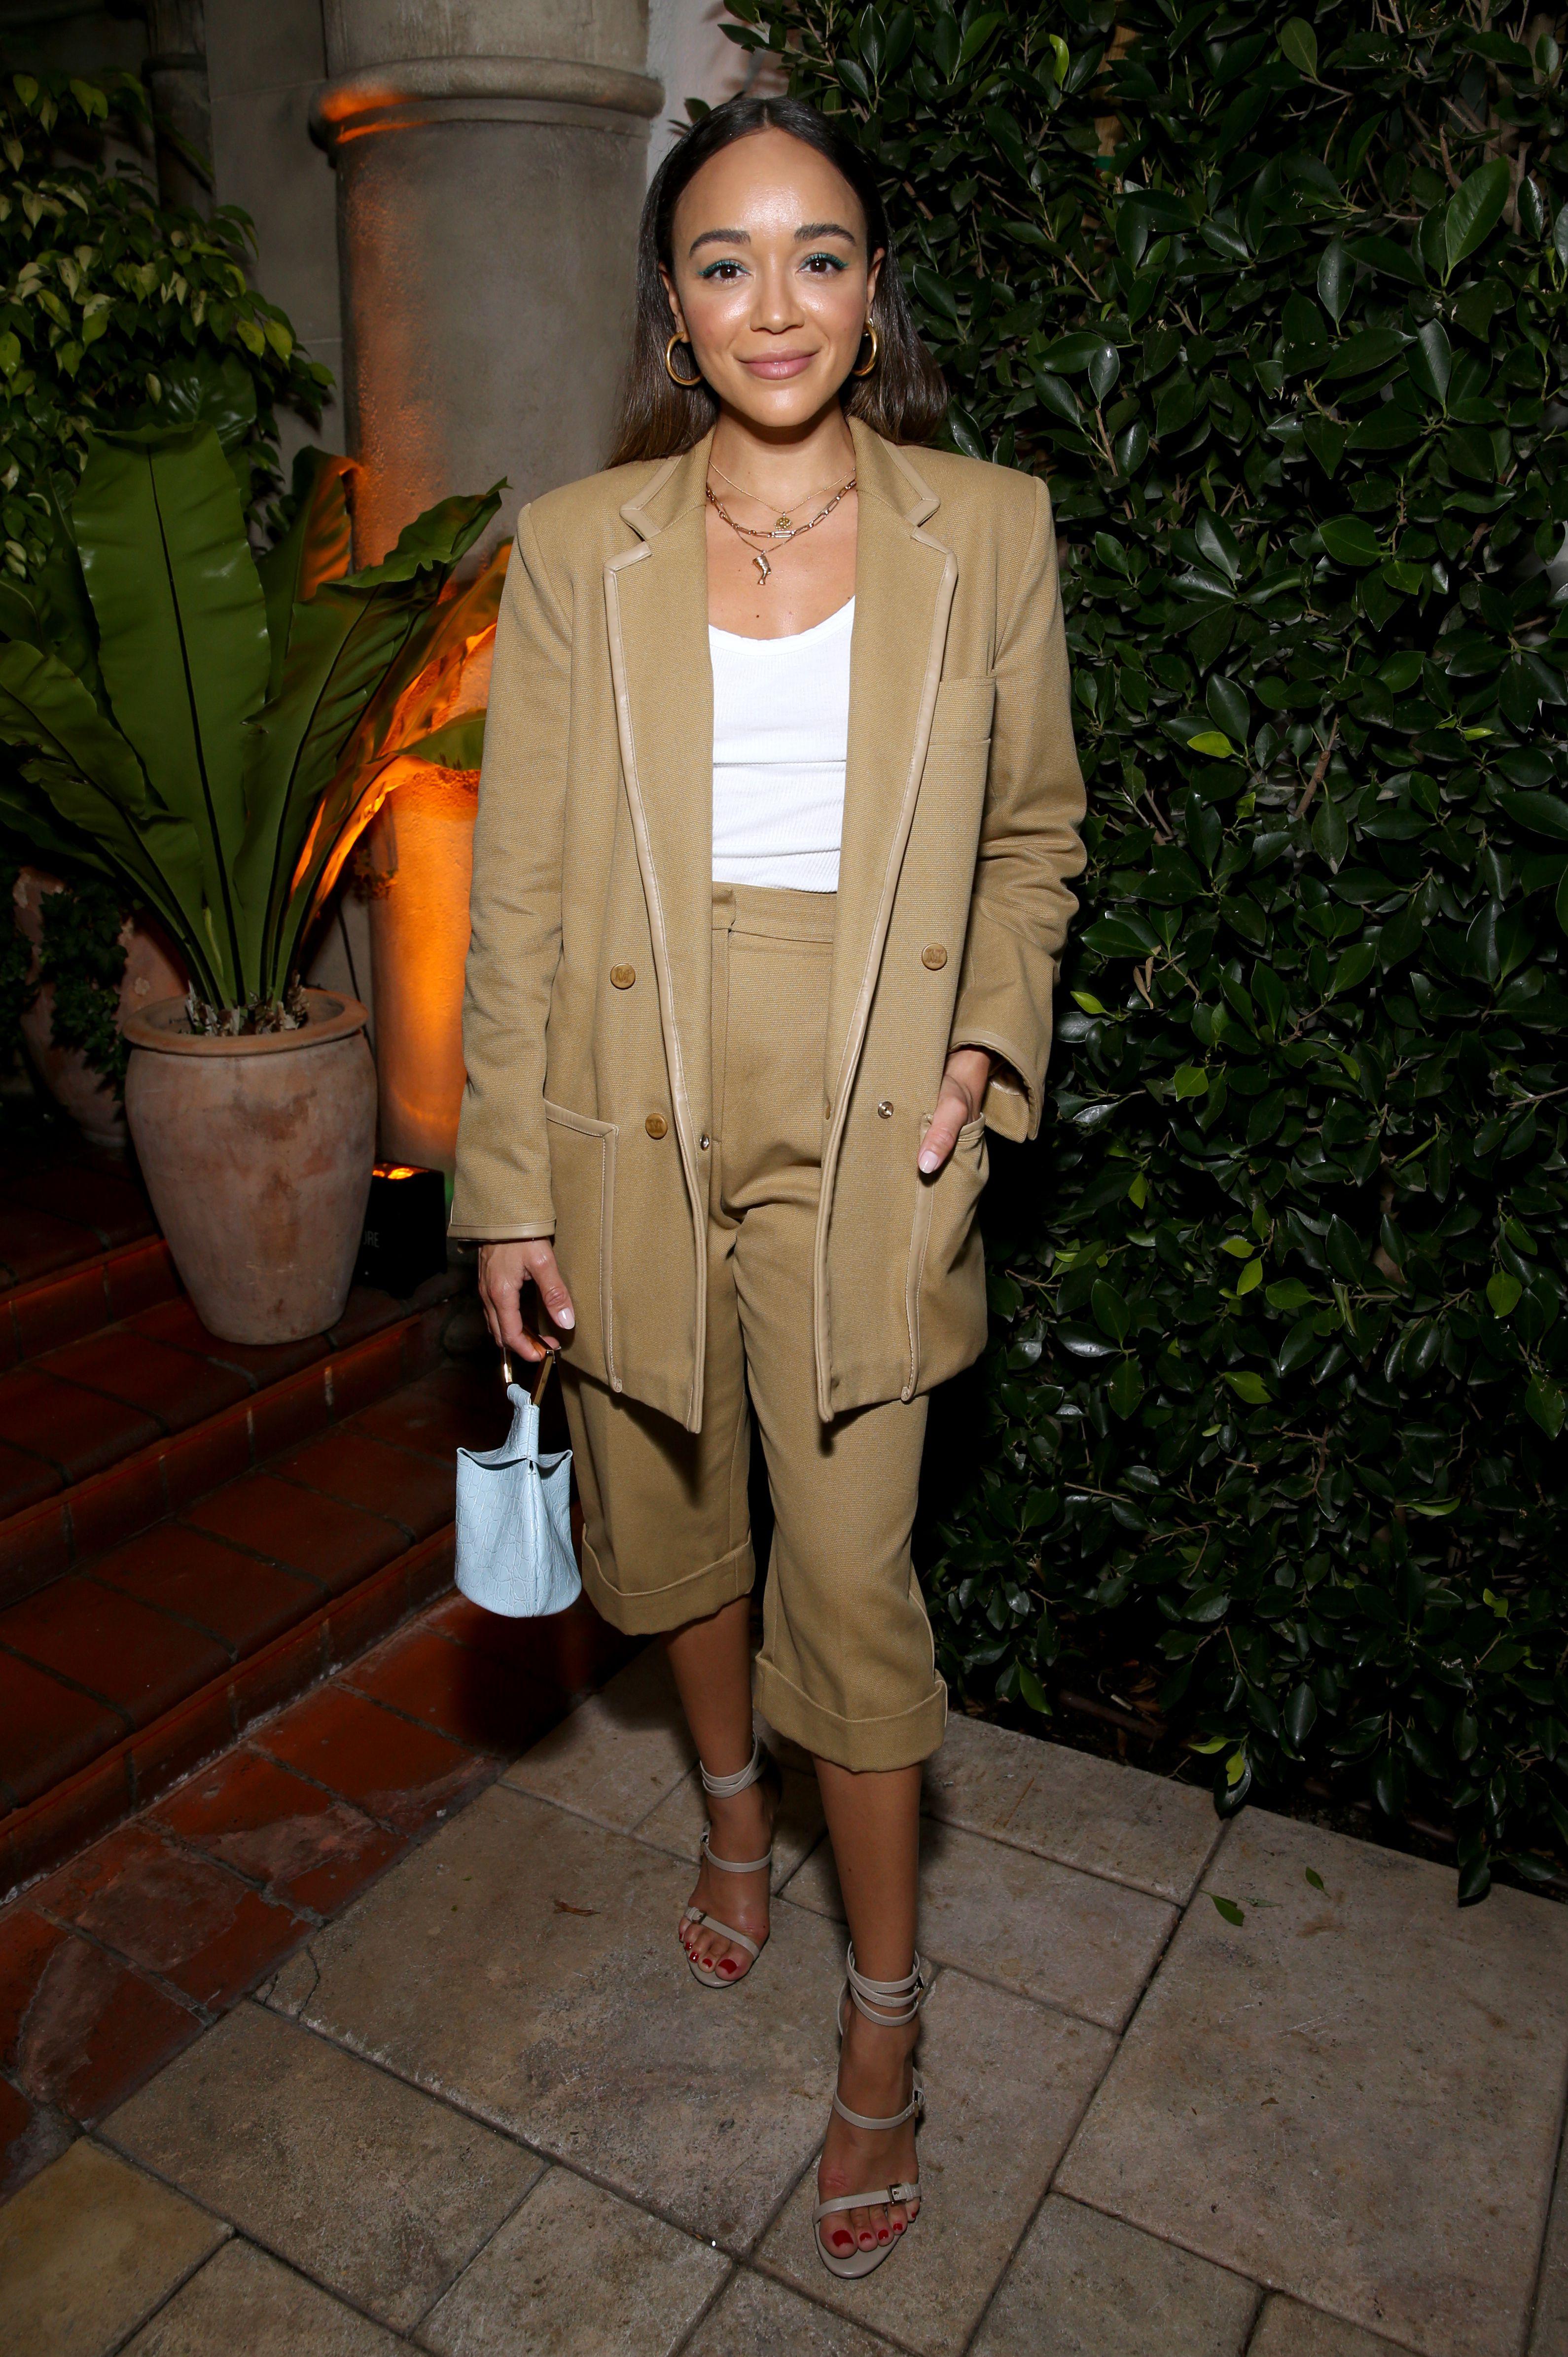 Ashley MadekweMaxMara Women in Film Event, Inside, Chateau Marmont, Los Angeles, USA - 11 Jun 2019 Wearing Max Mara